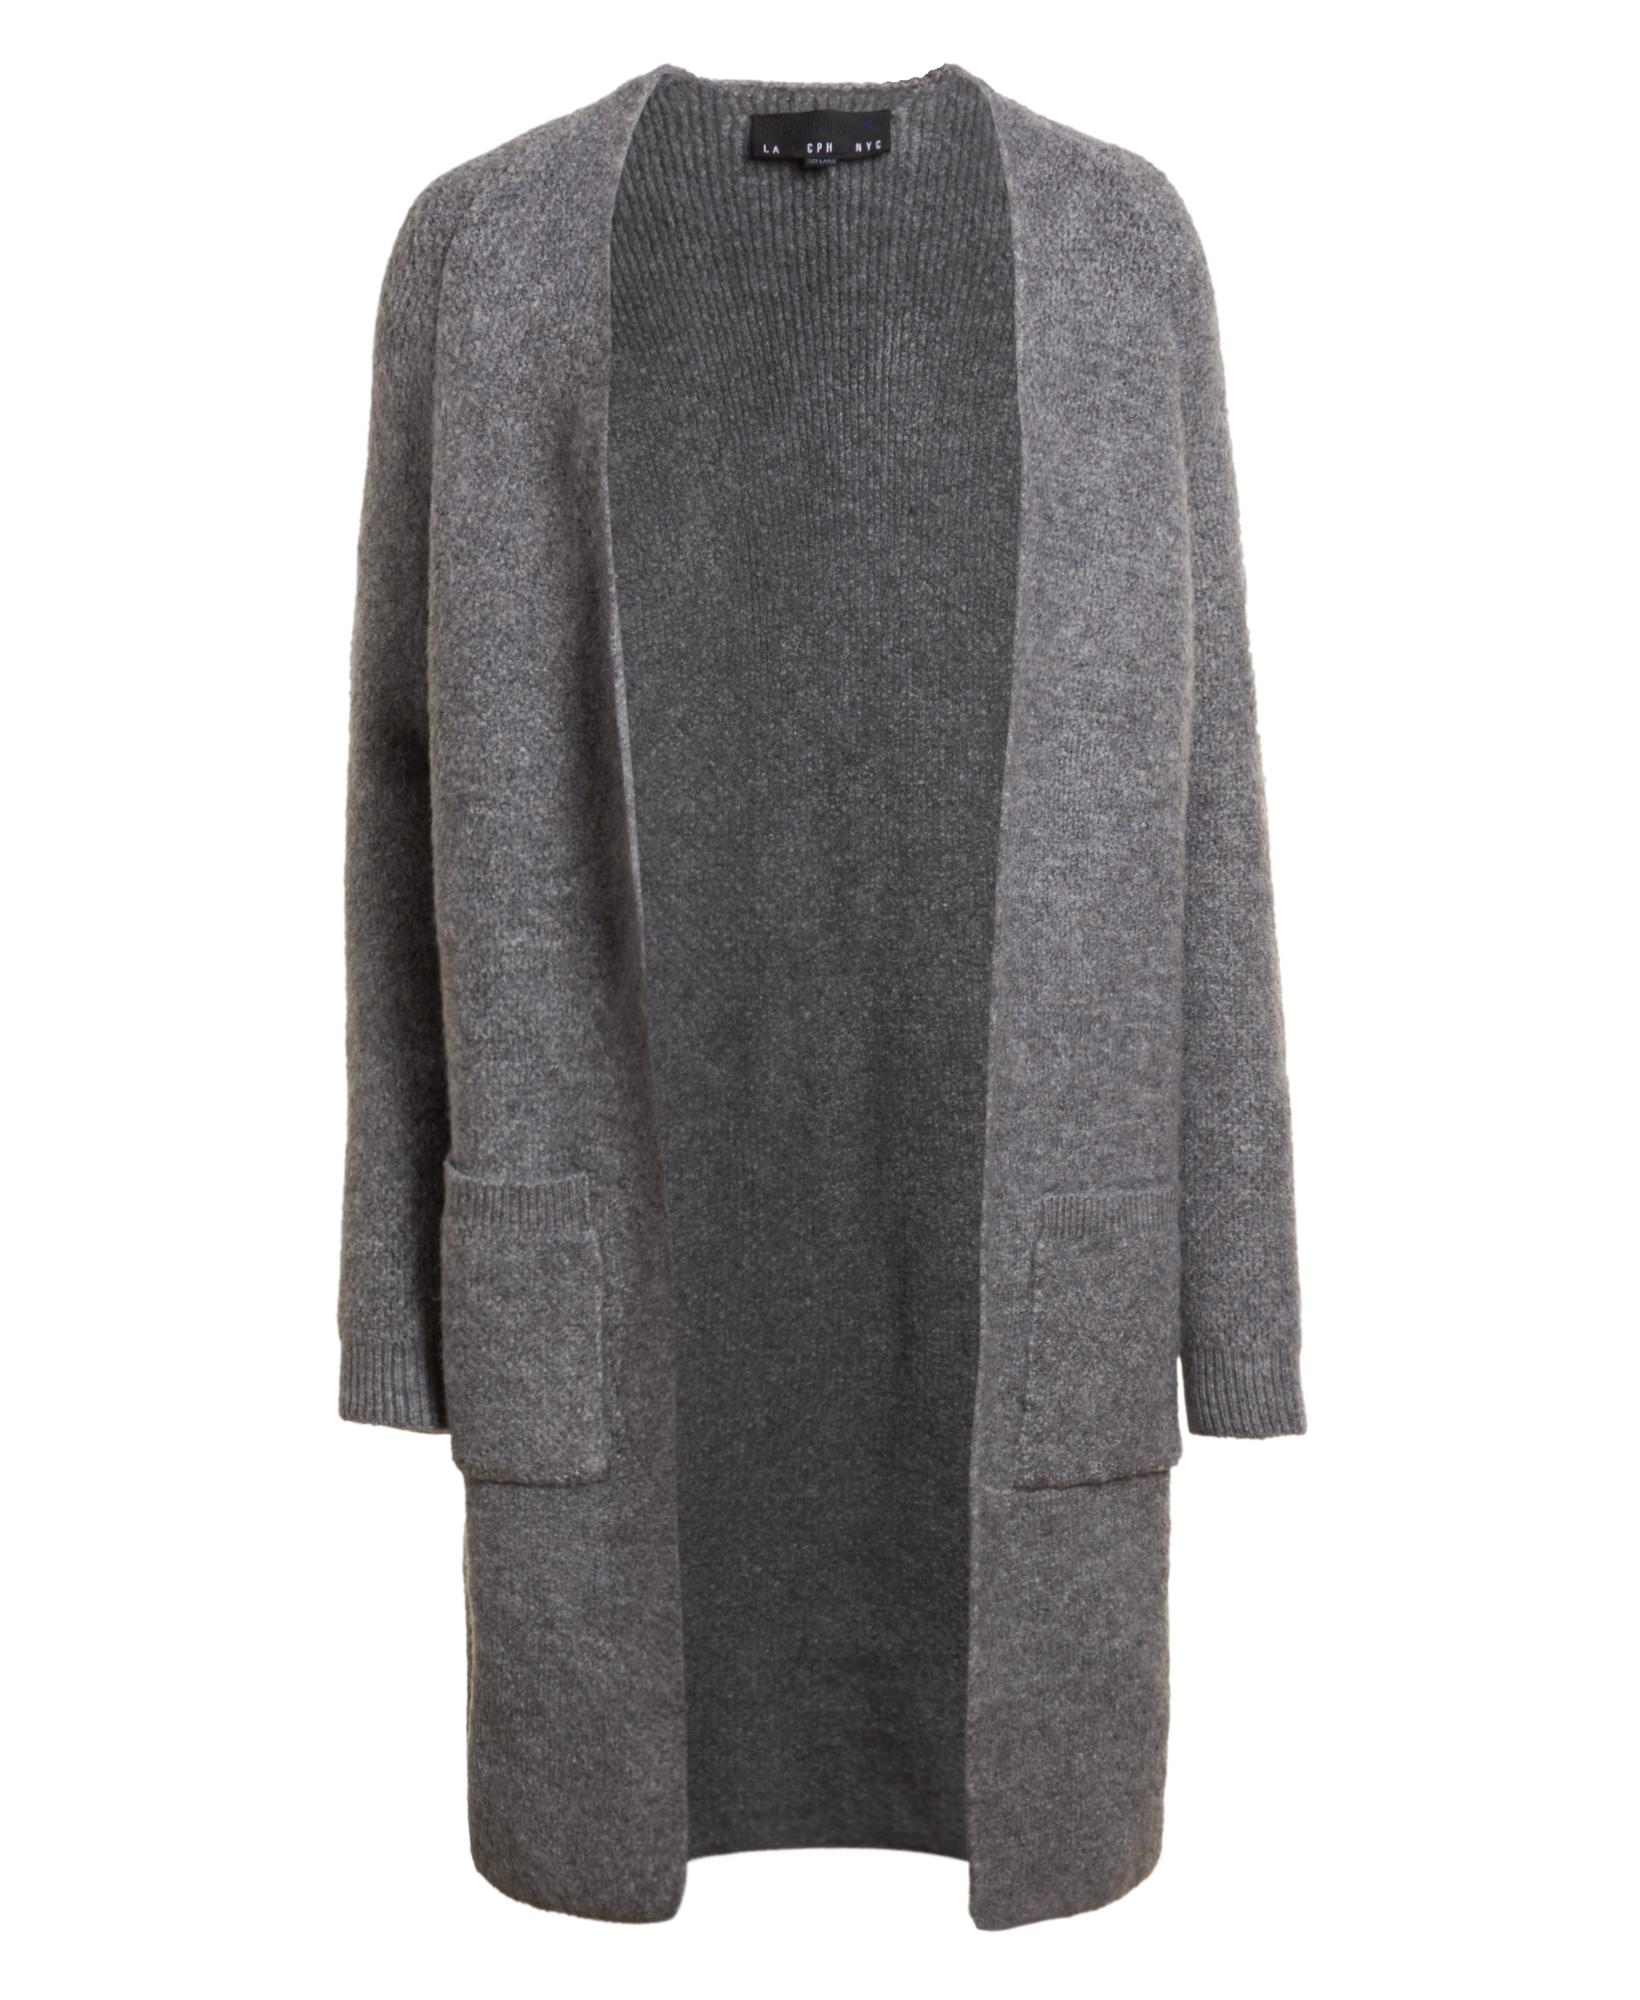 New Womens Superdry Anya Longline Cardigan Grey Marl   eBay